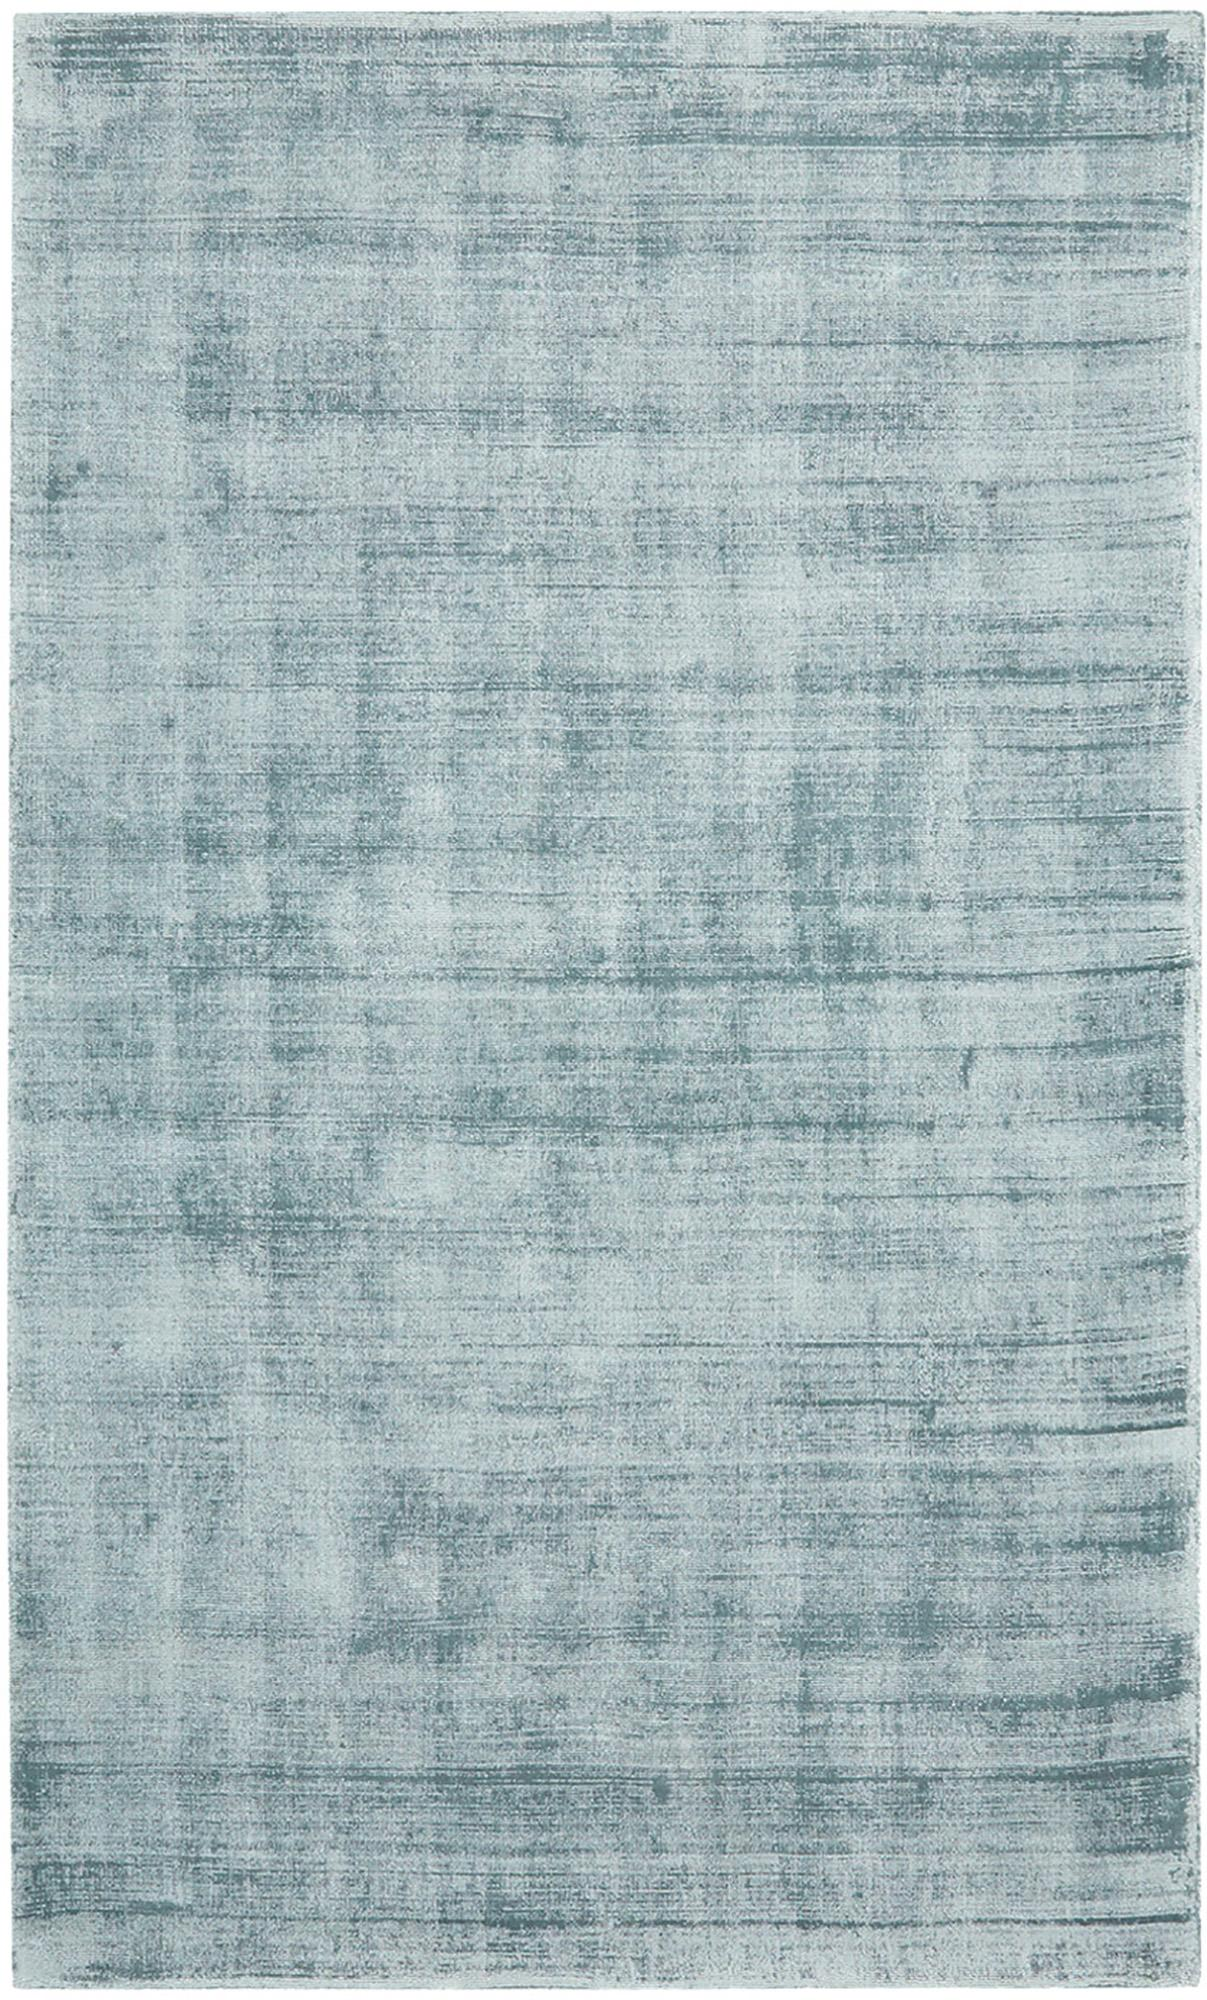 Handgewebter Viskoseteppich Jane in Eisblau, Flor: 100% Viskose, Eisblau, B 90 x L 150 cm (Größe XS)